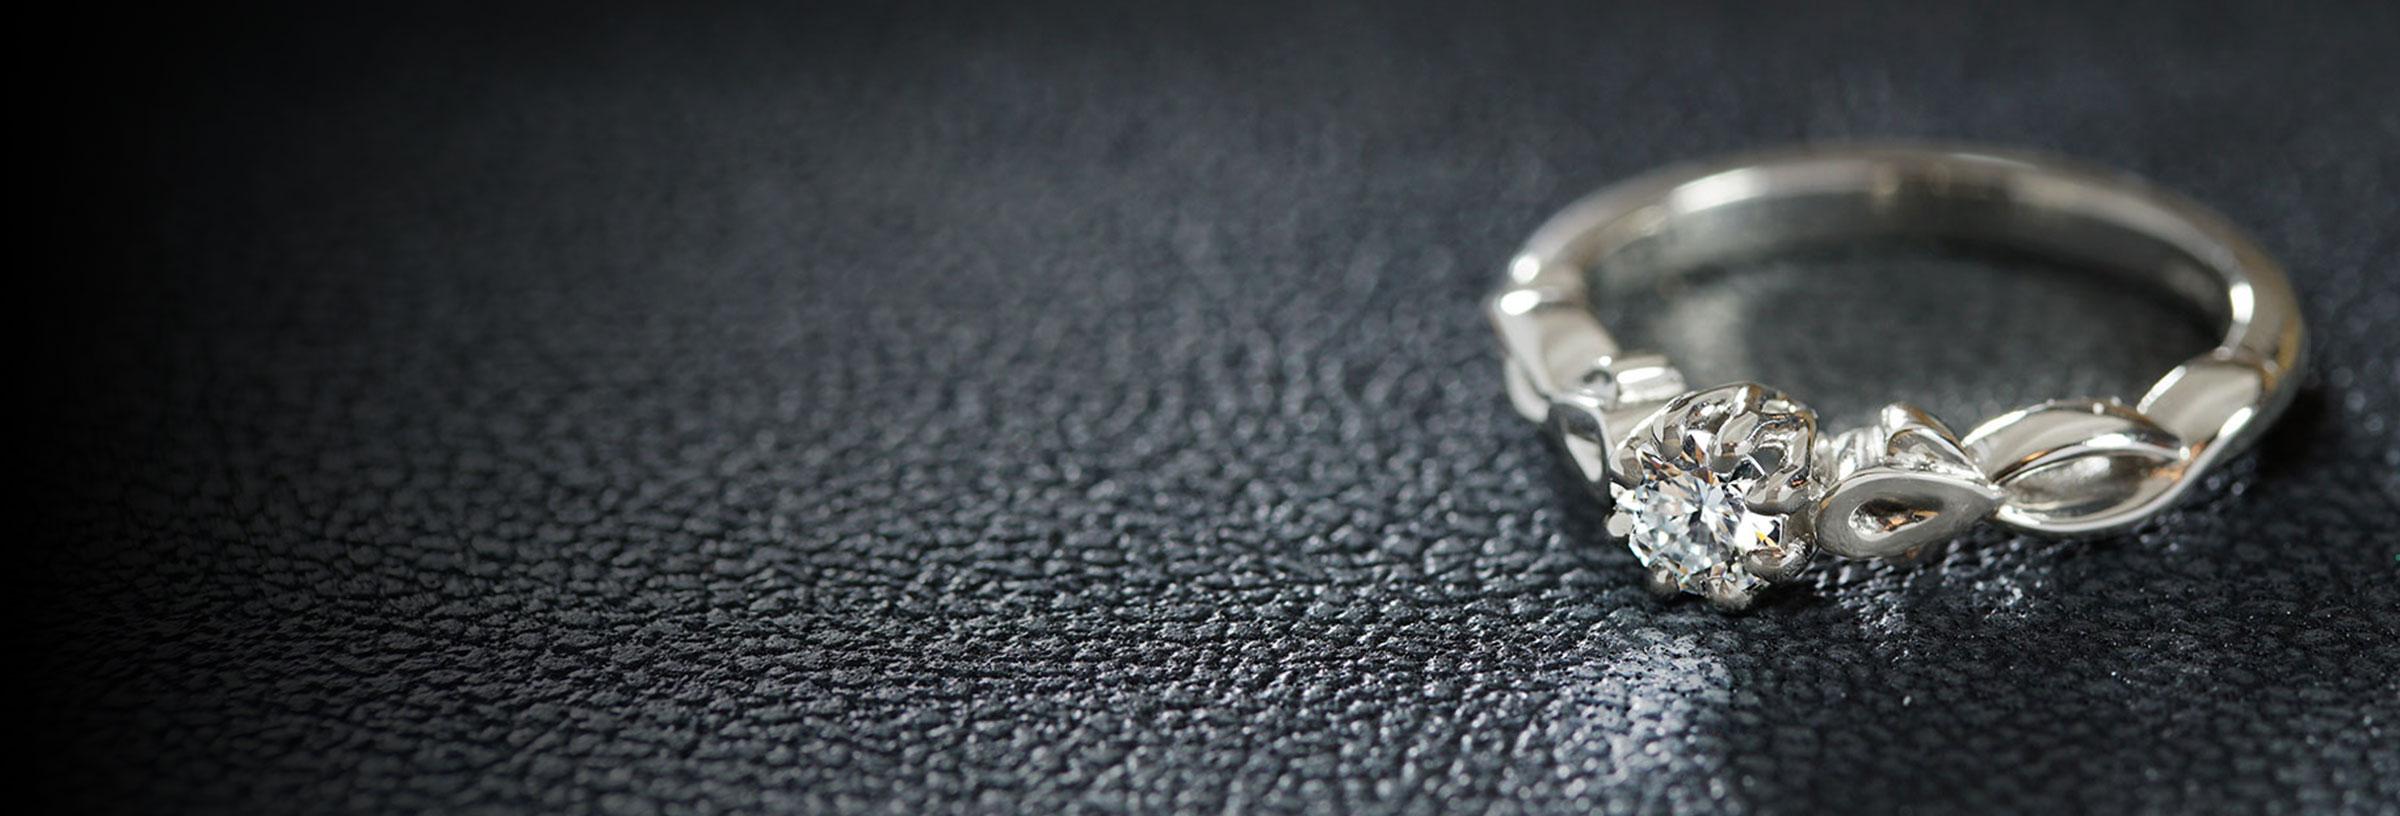 platinum-twisting-vine-inspired-diamond-engagement